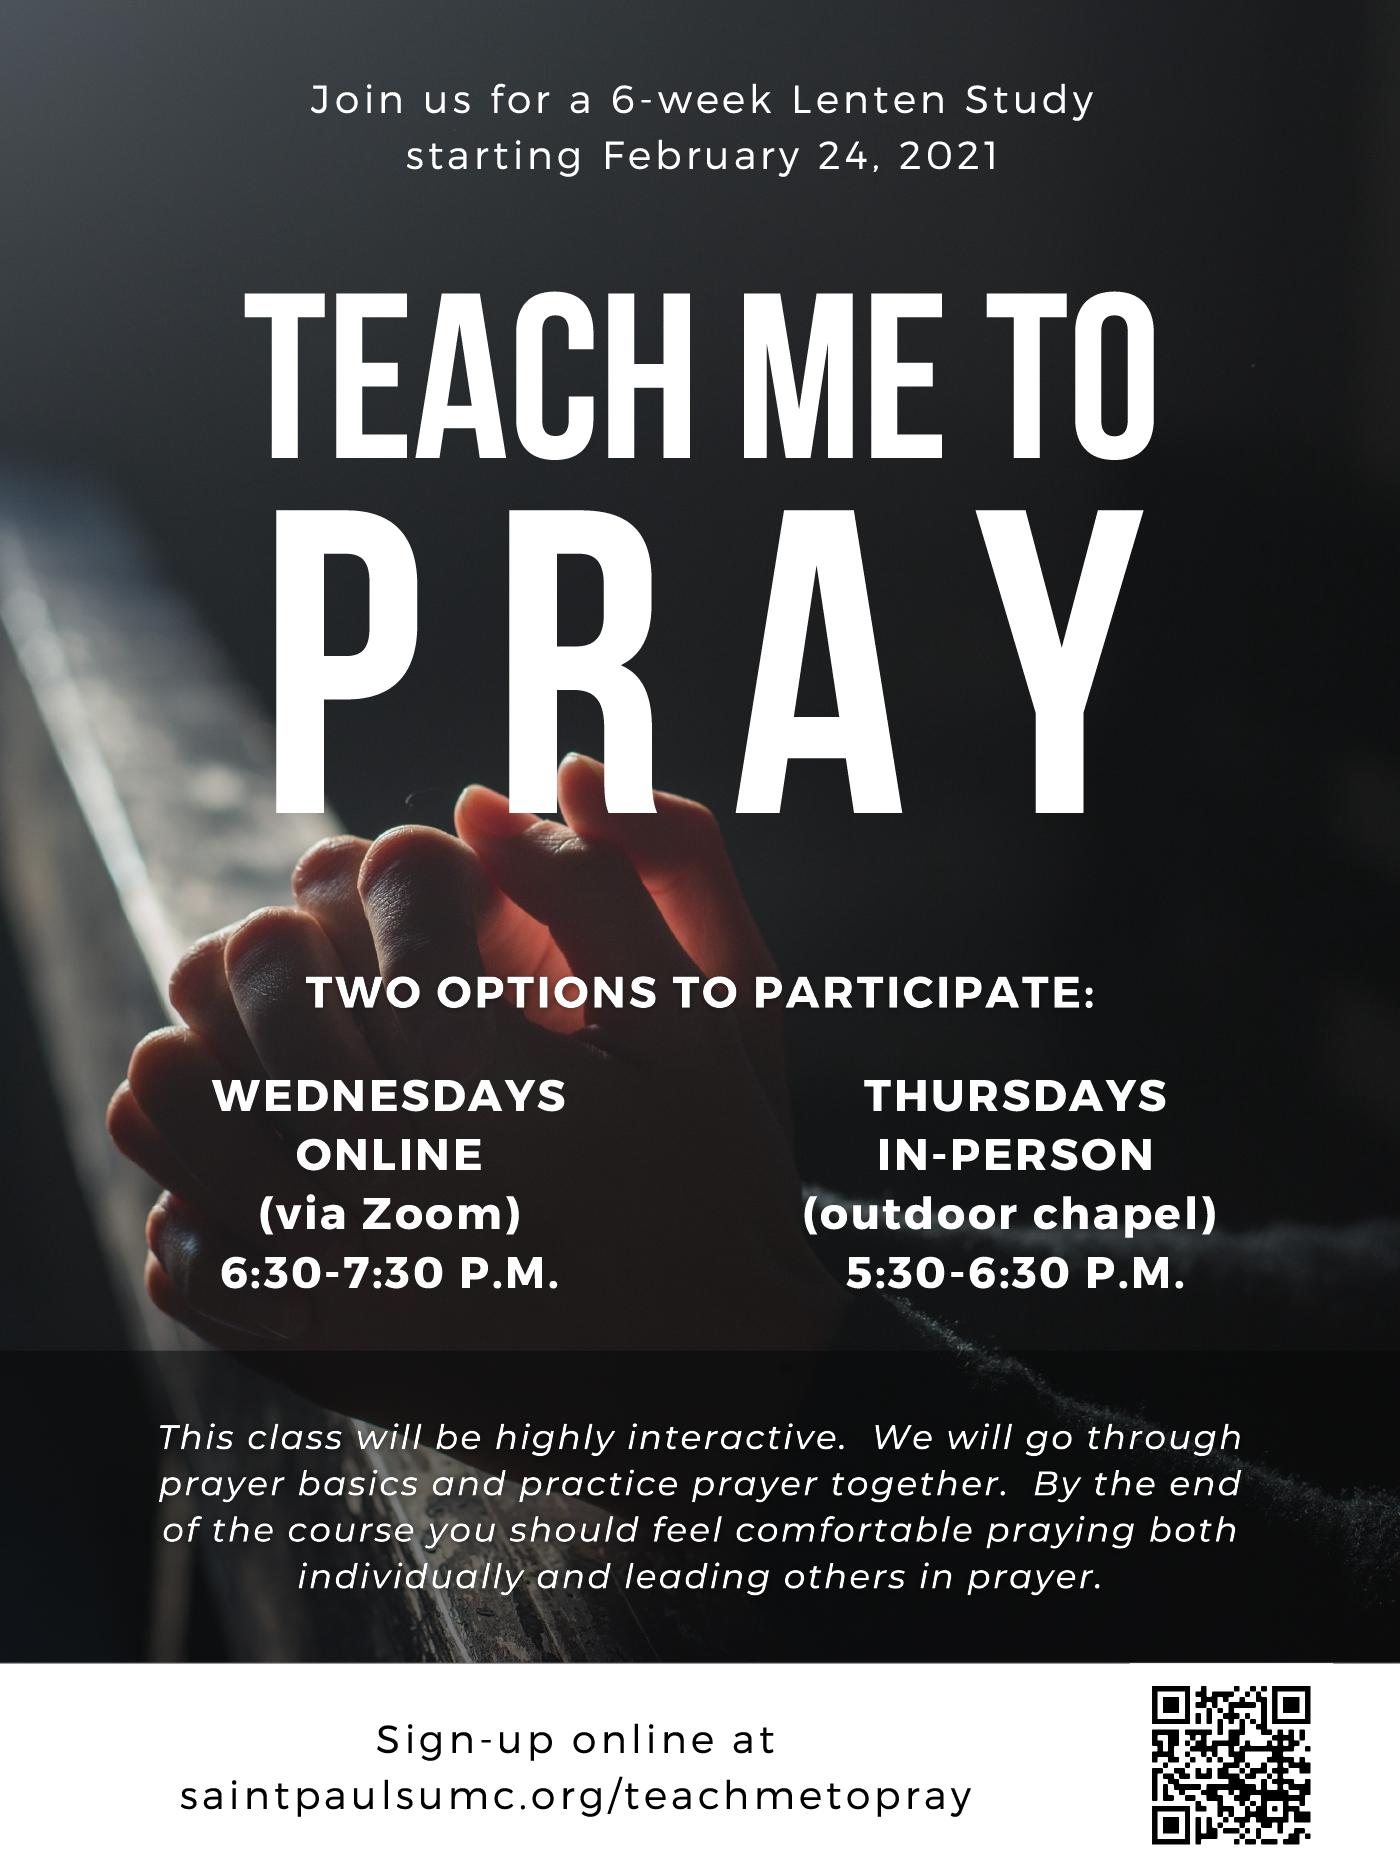 Join us for a 6-week Lenten Study